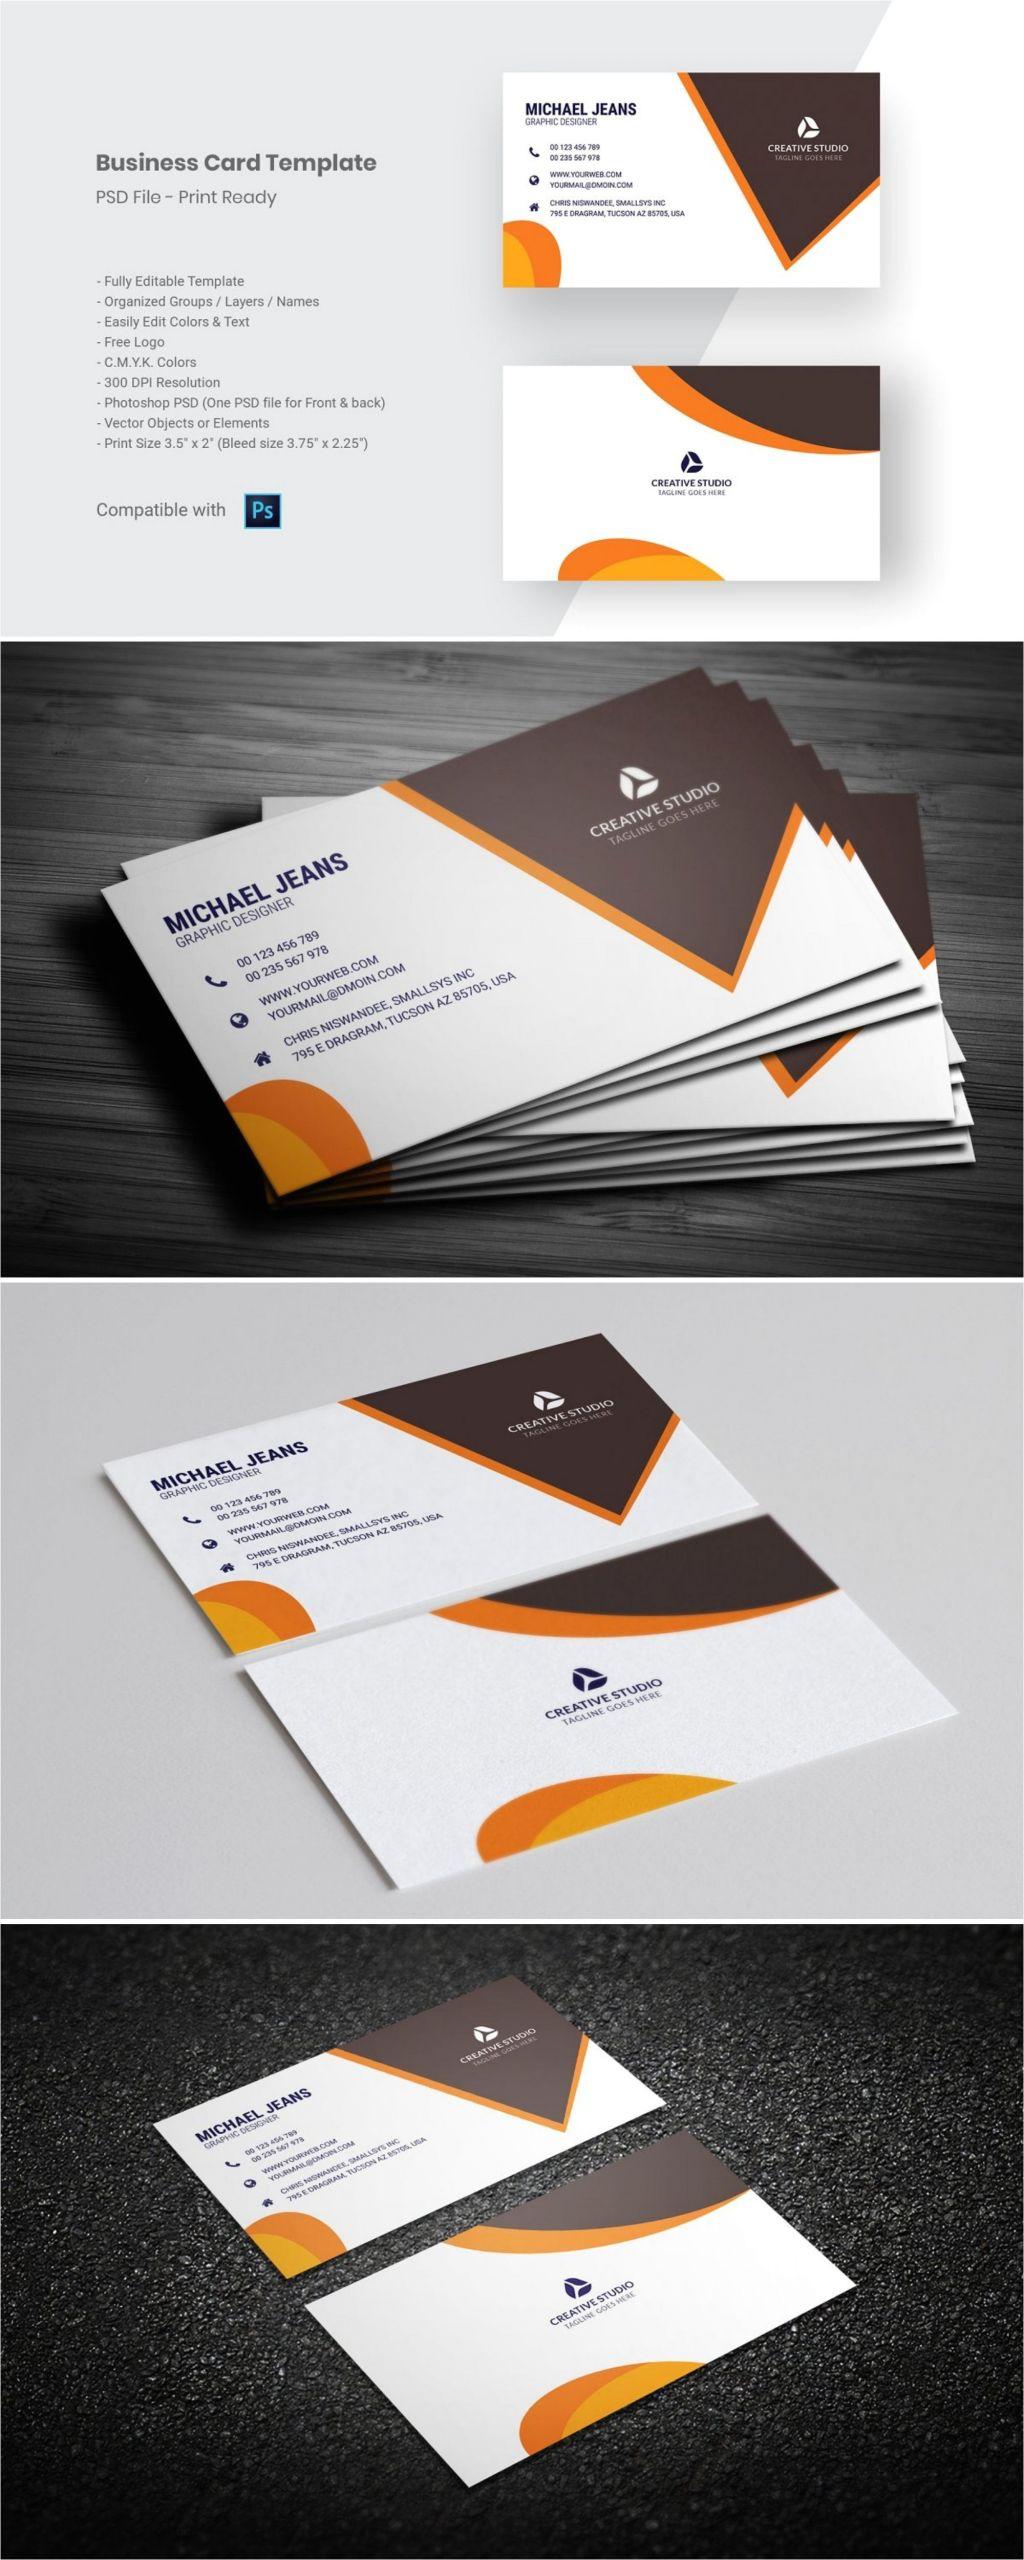 Photo Studio Visiting Card Background Modern Business Card Template Business Card Template